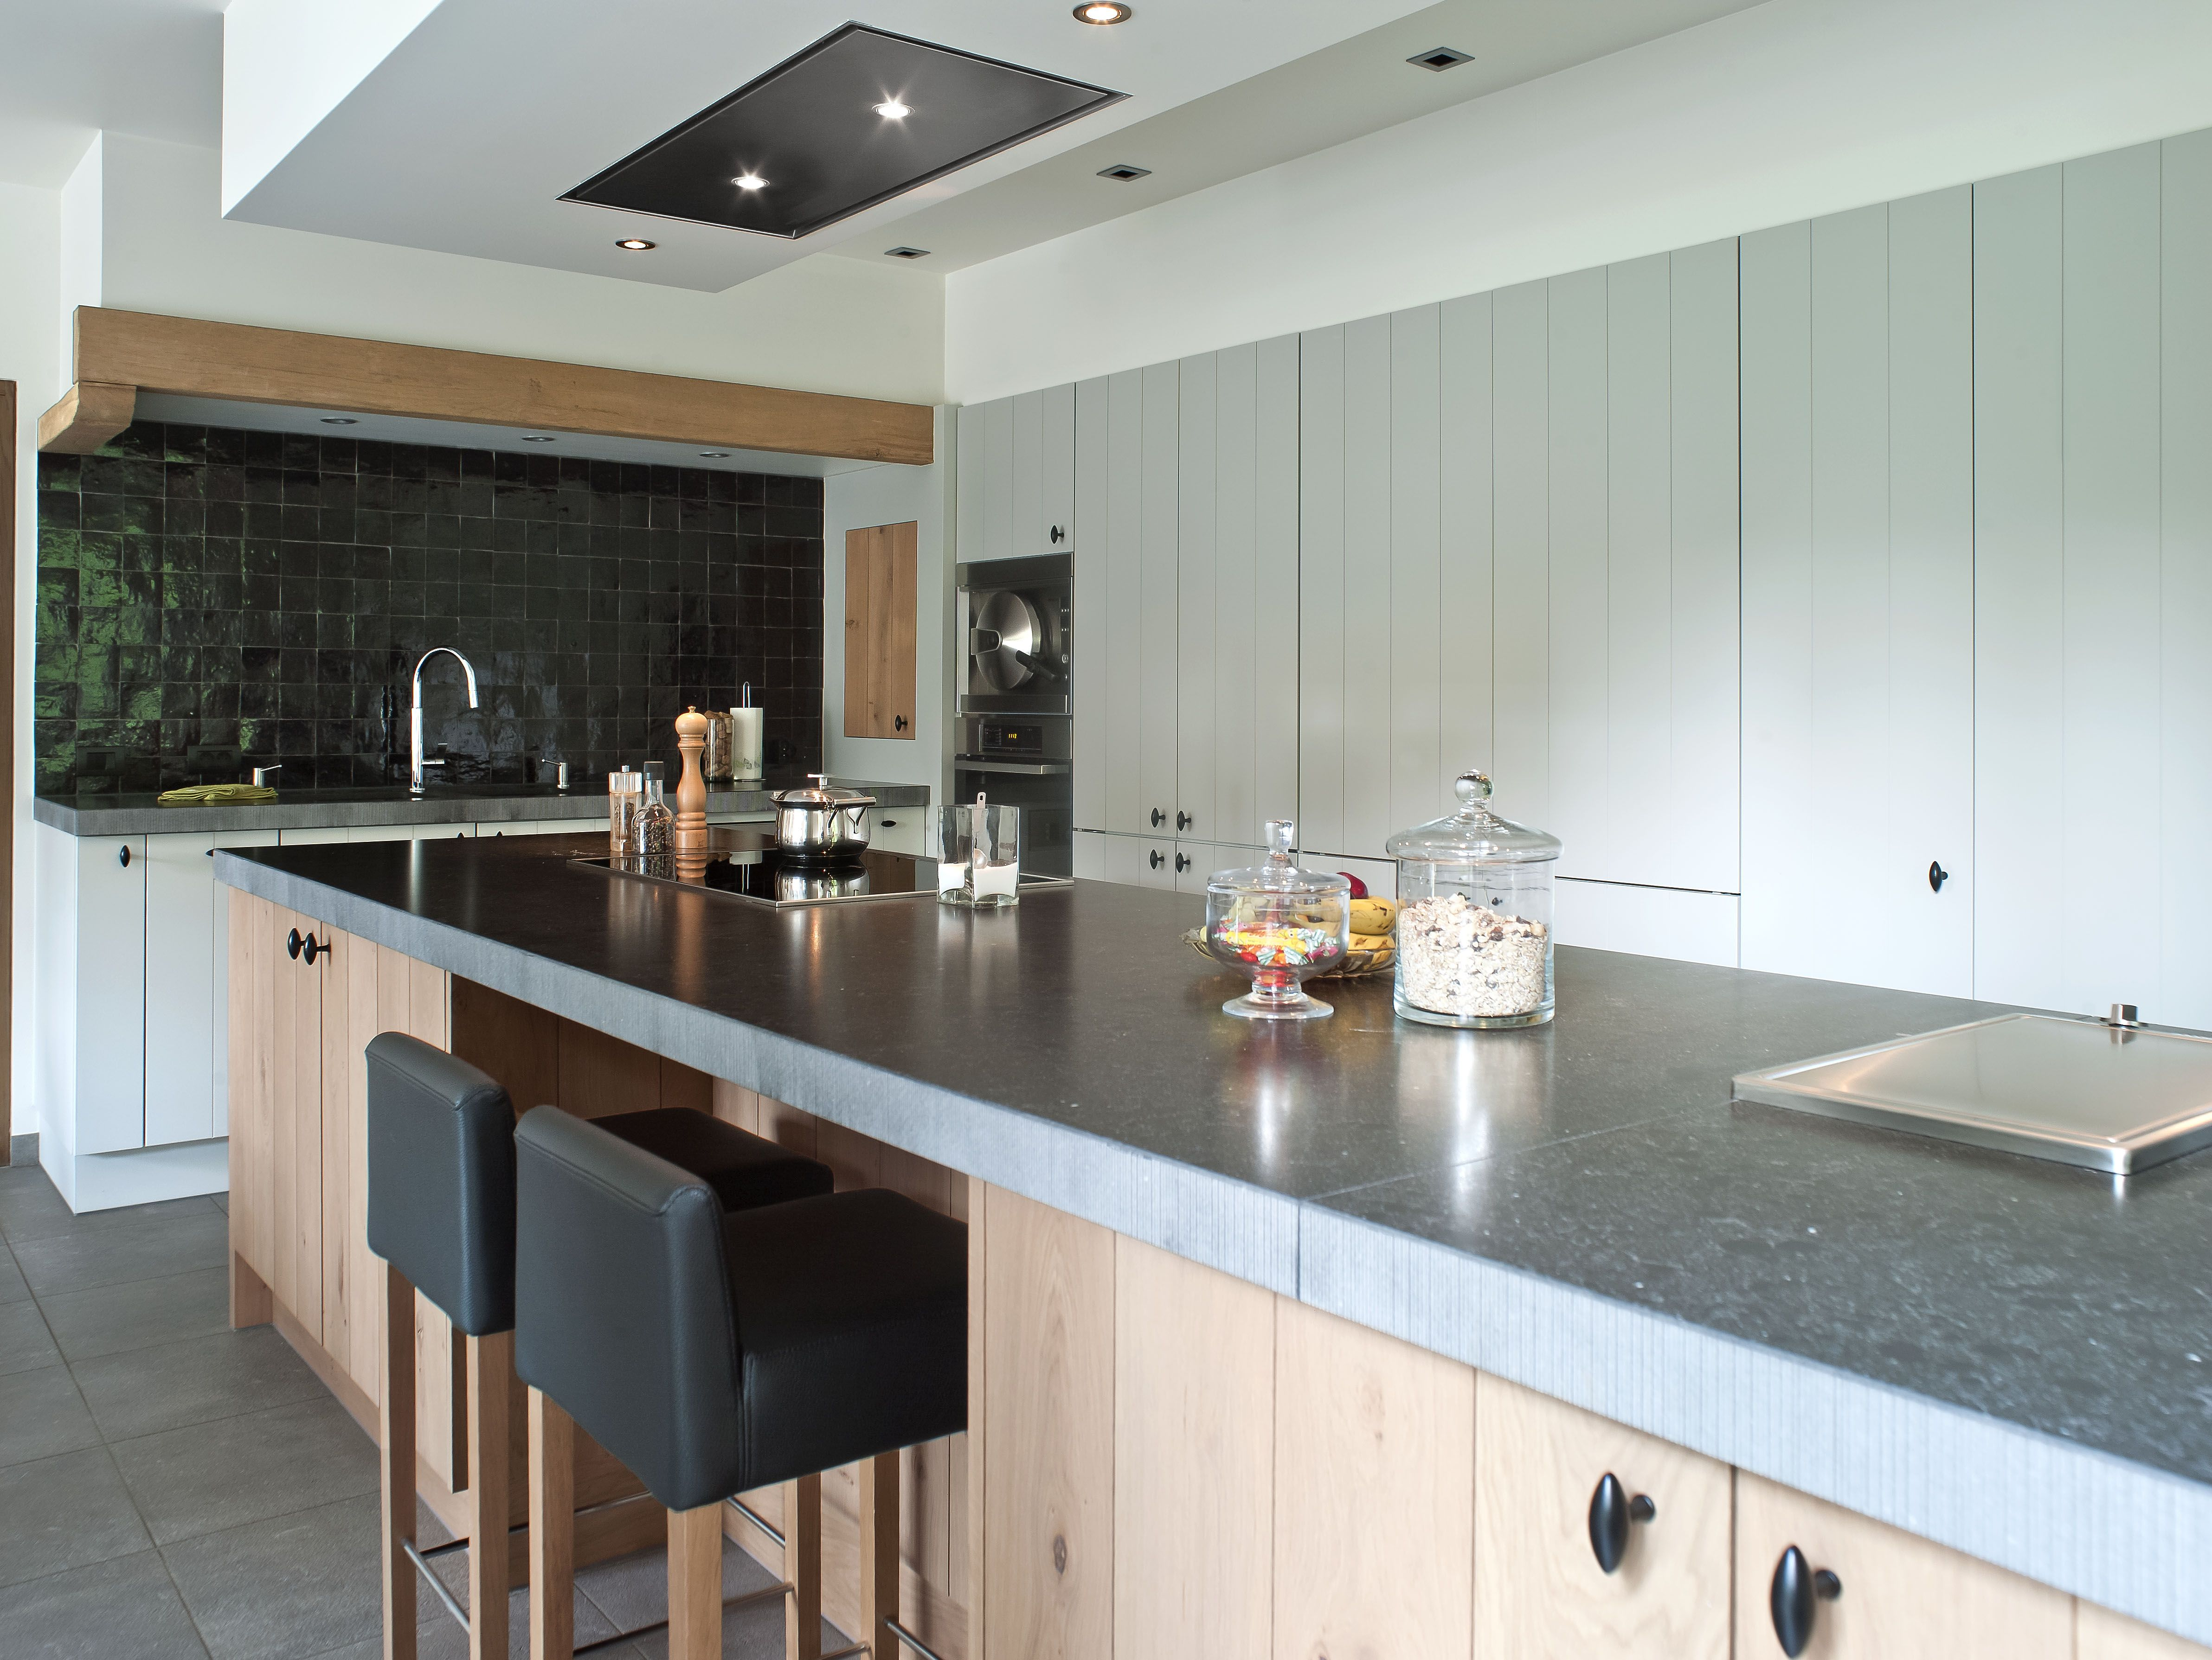 impermo keukentegels : Landelijke Keuken Mdf Geschilderd En Massieve Eik Belgian Style